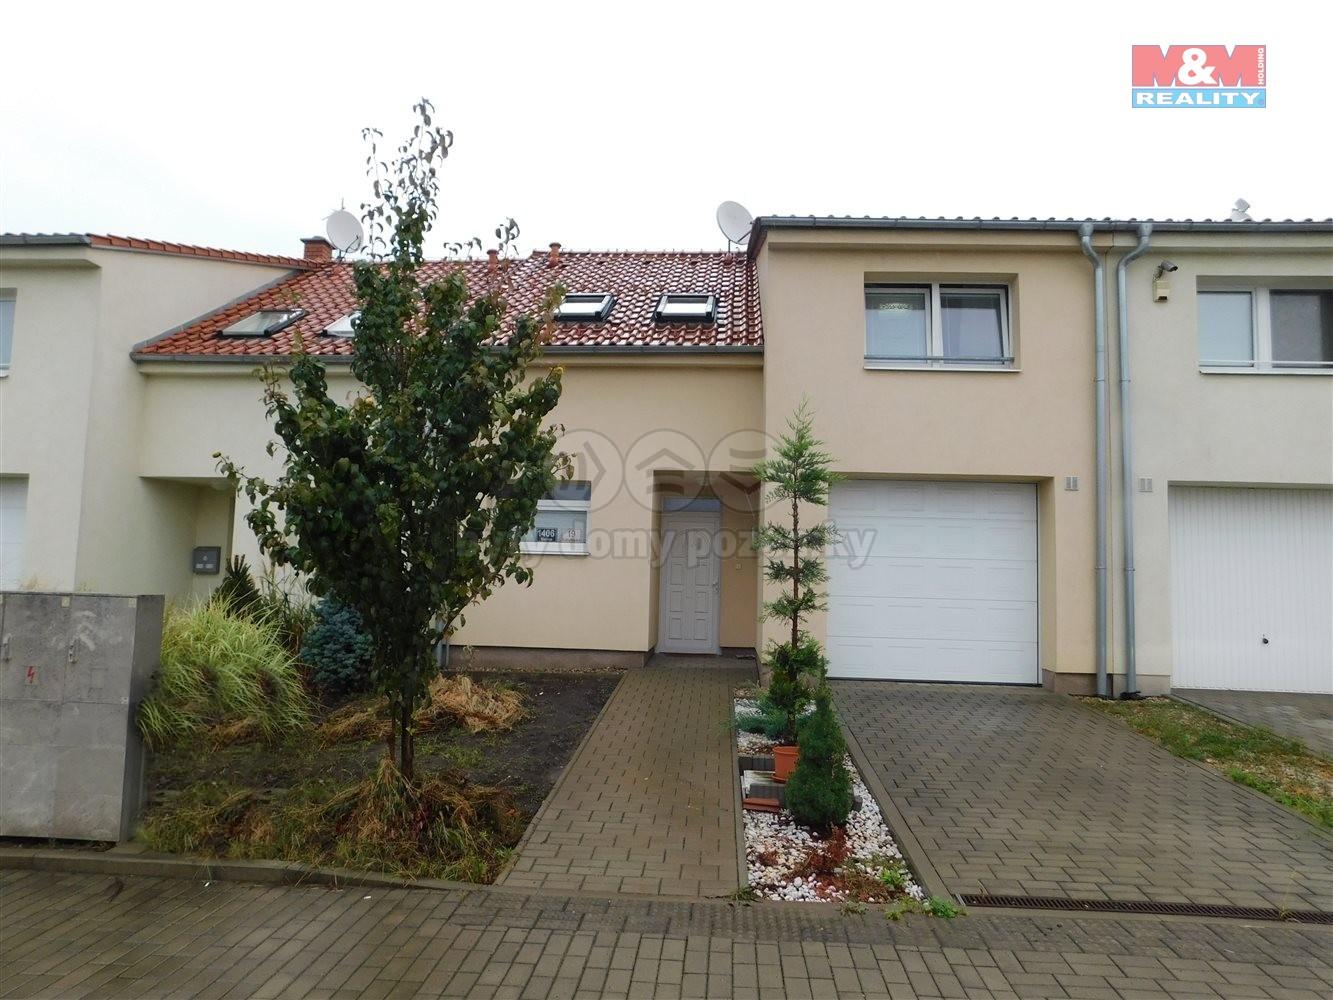 Pronájem rodinného domu 5+1, Brno